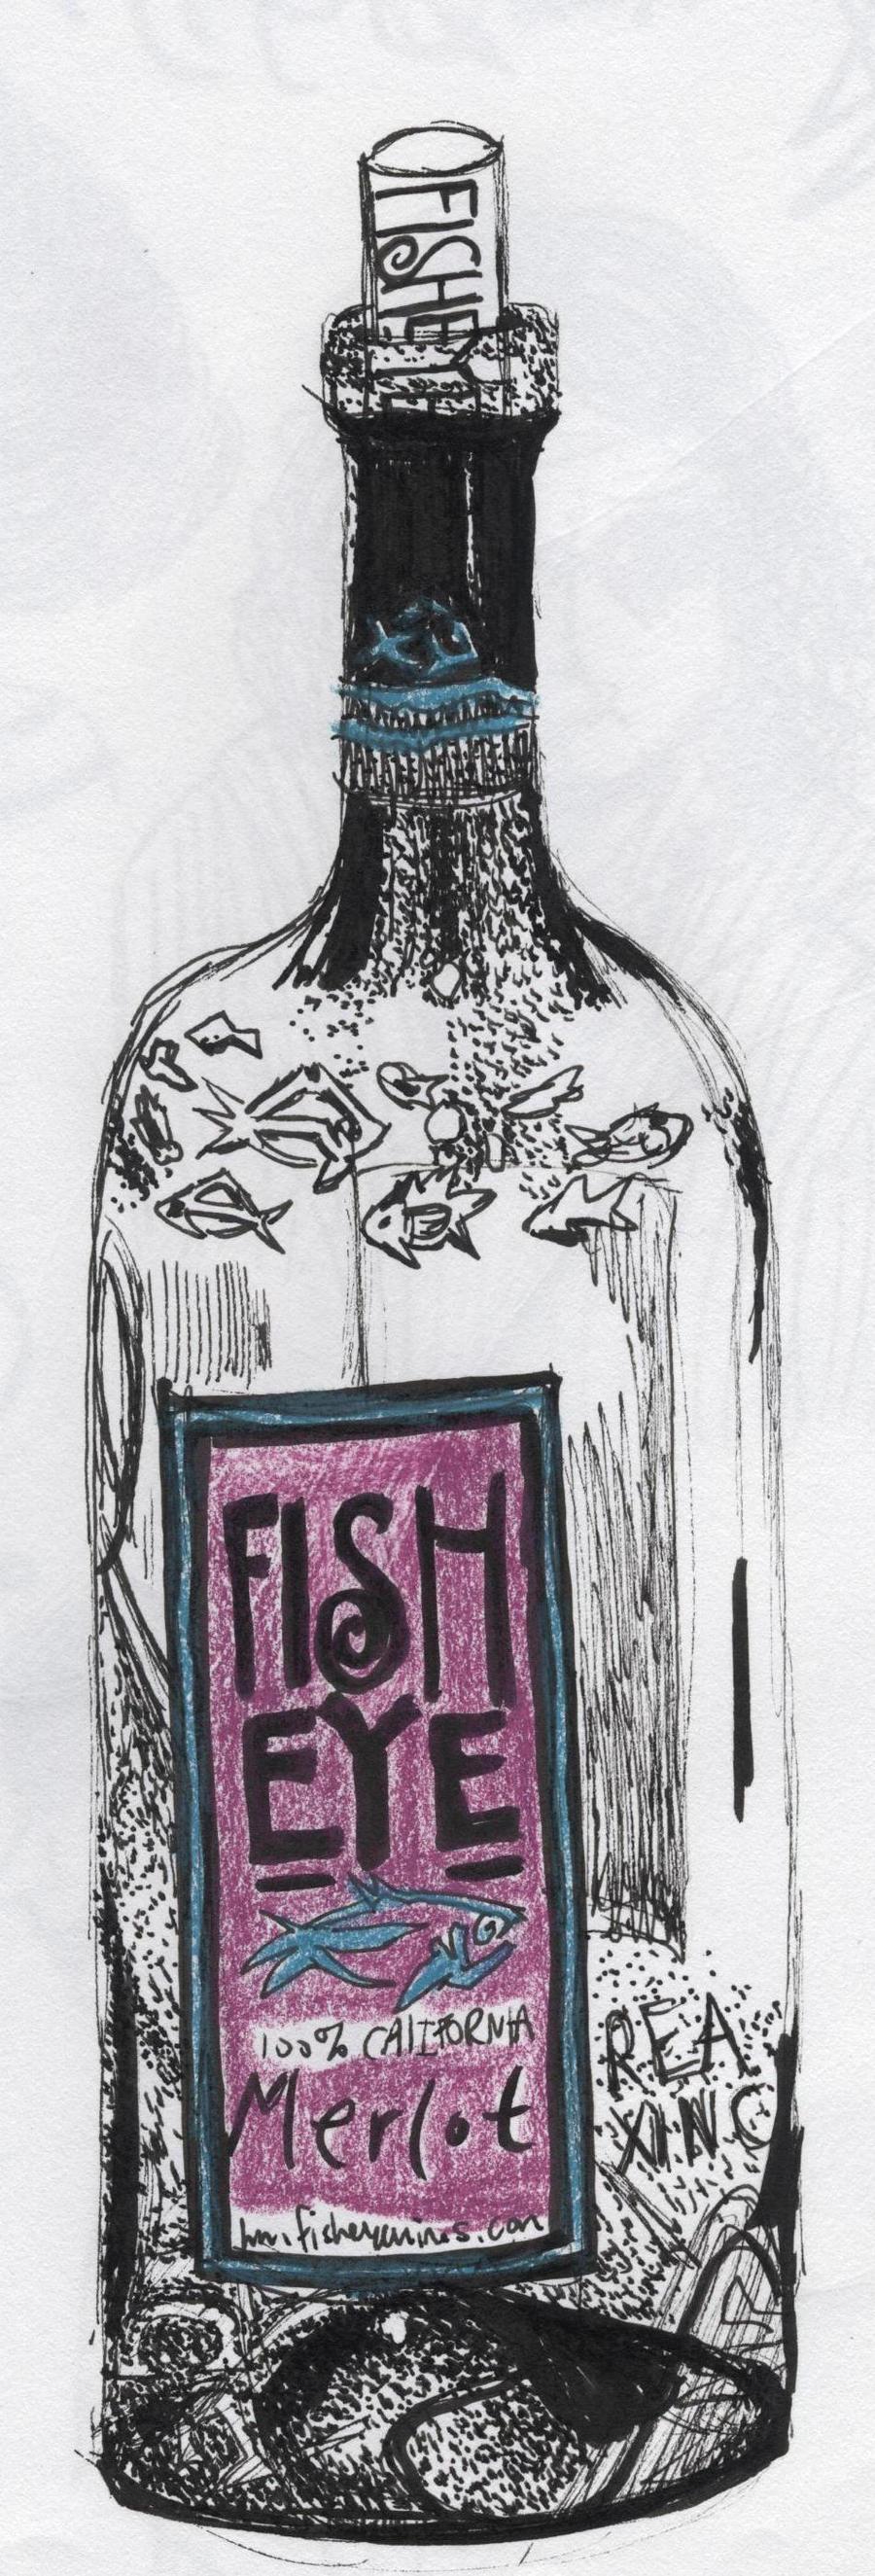 Fish eye wine by xessentax on deviantart for Fish eye wine